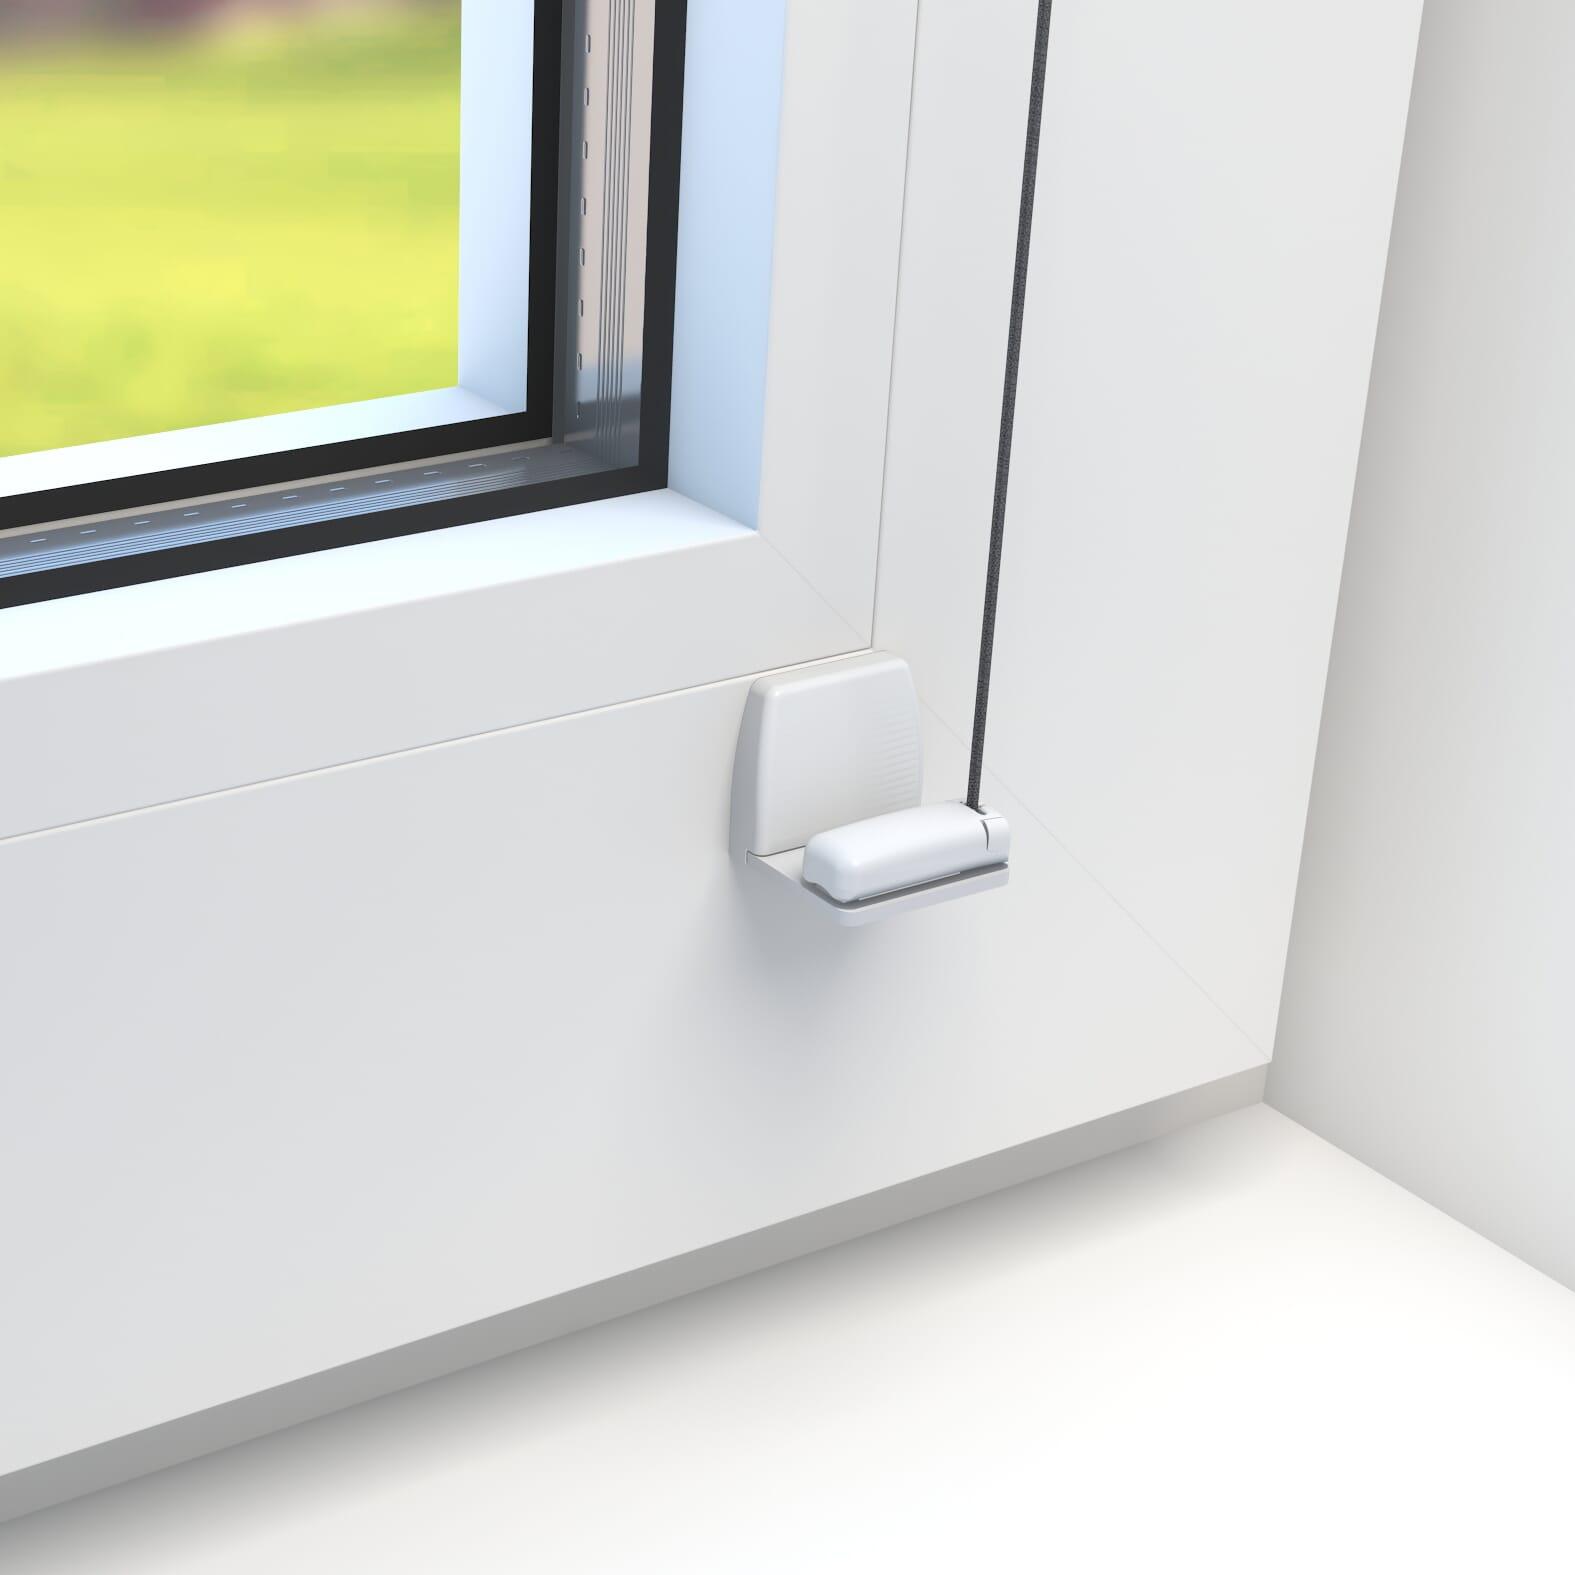 Fenster Montage Winkel